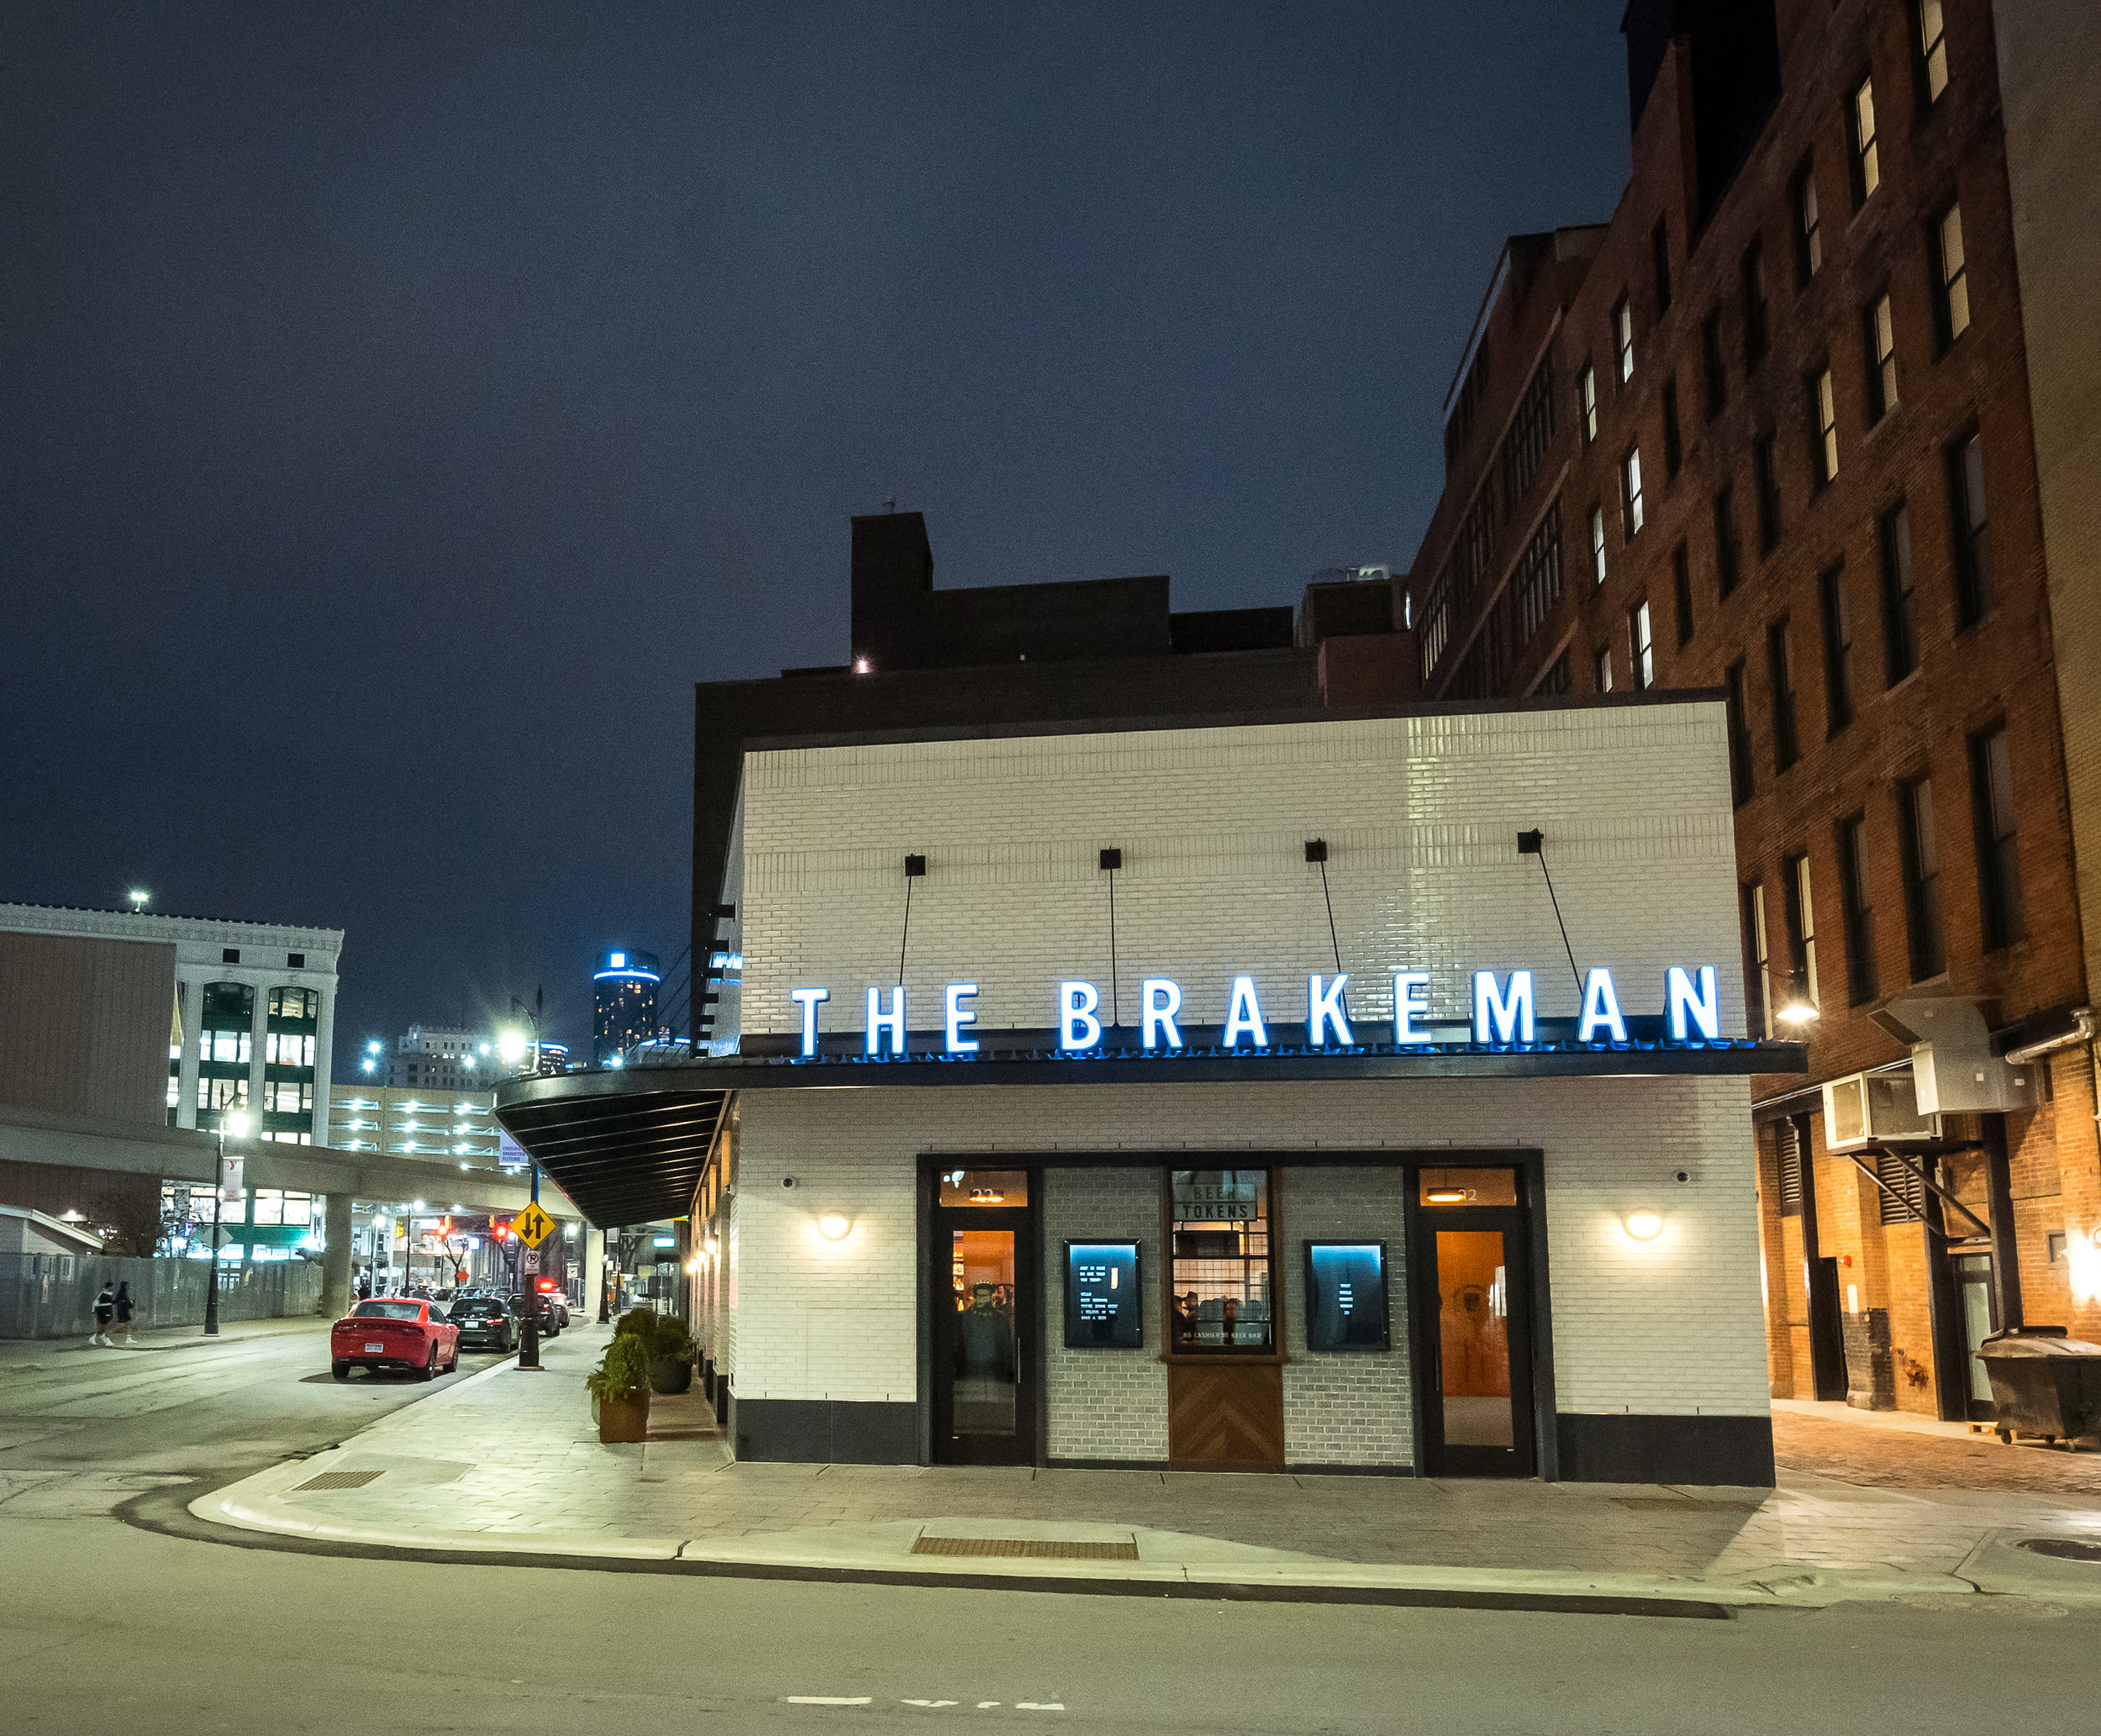 The Brakeman